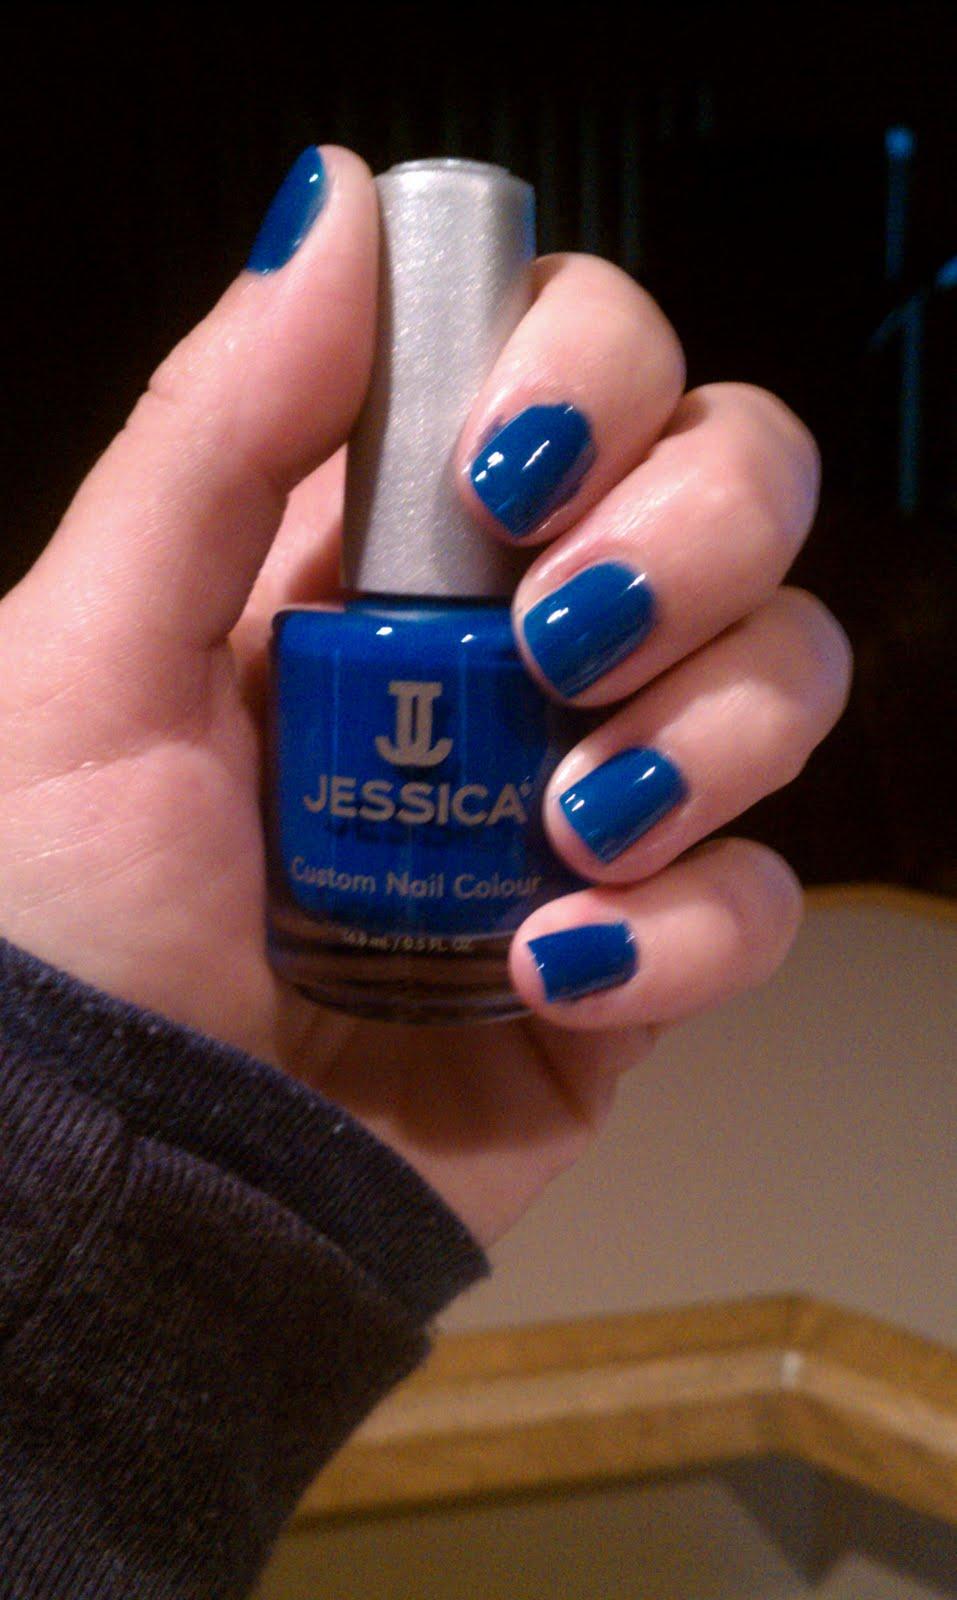 Lipgloss Break: Jessica Nail Polish in Blue Blast